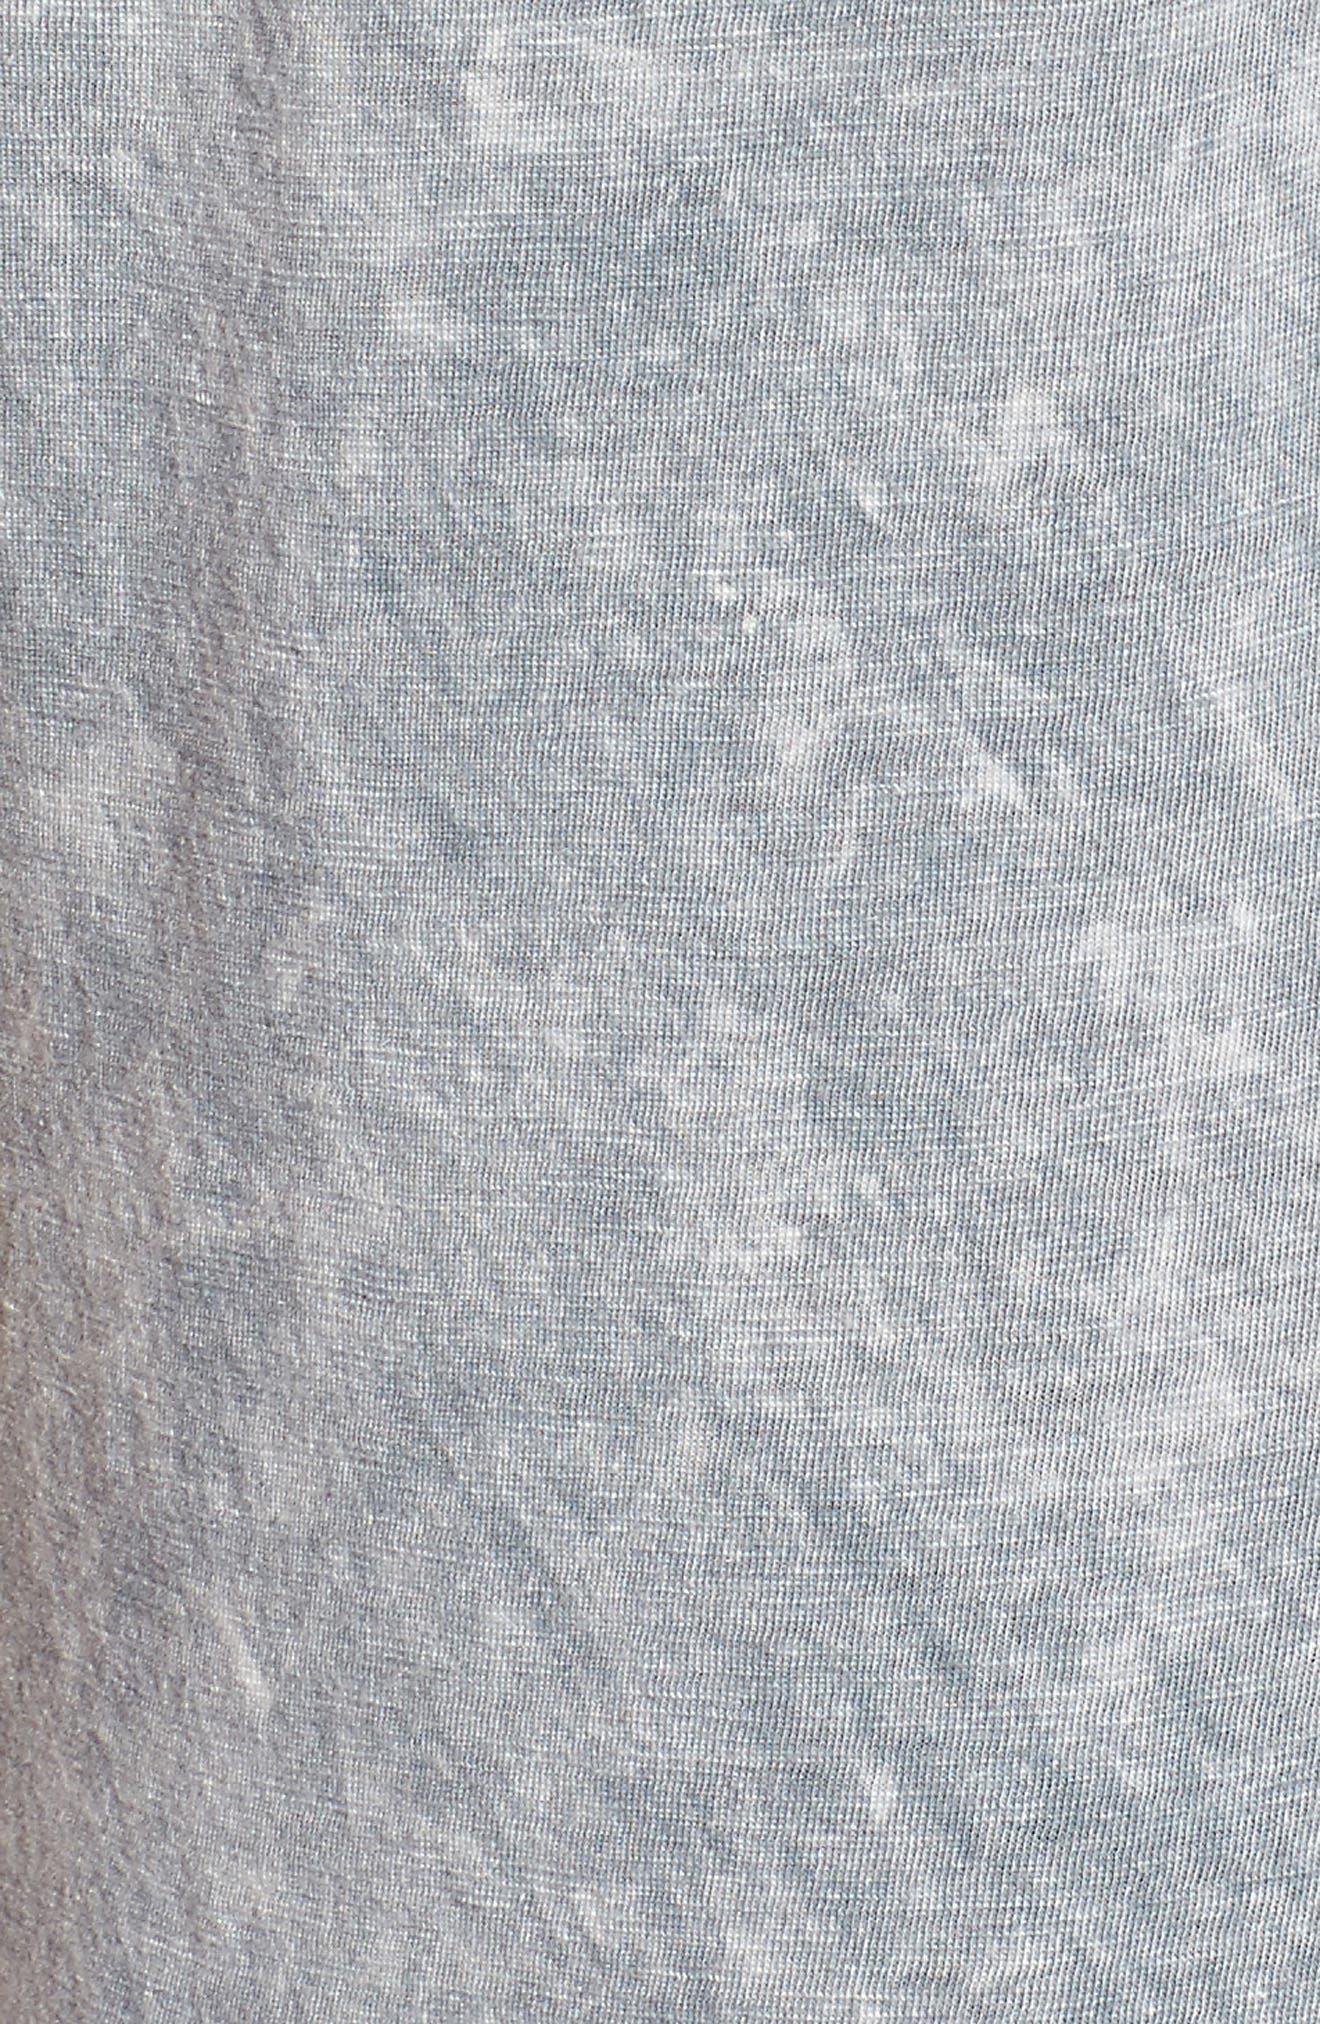 Mineral Wash Ruffle Hem Tee,                             Alternate thumbnail 5, color,                             020